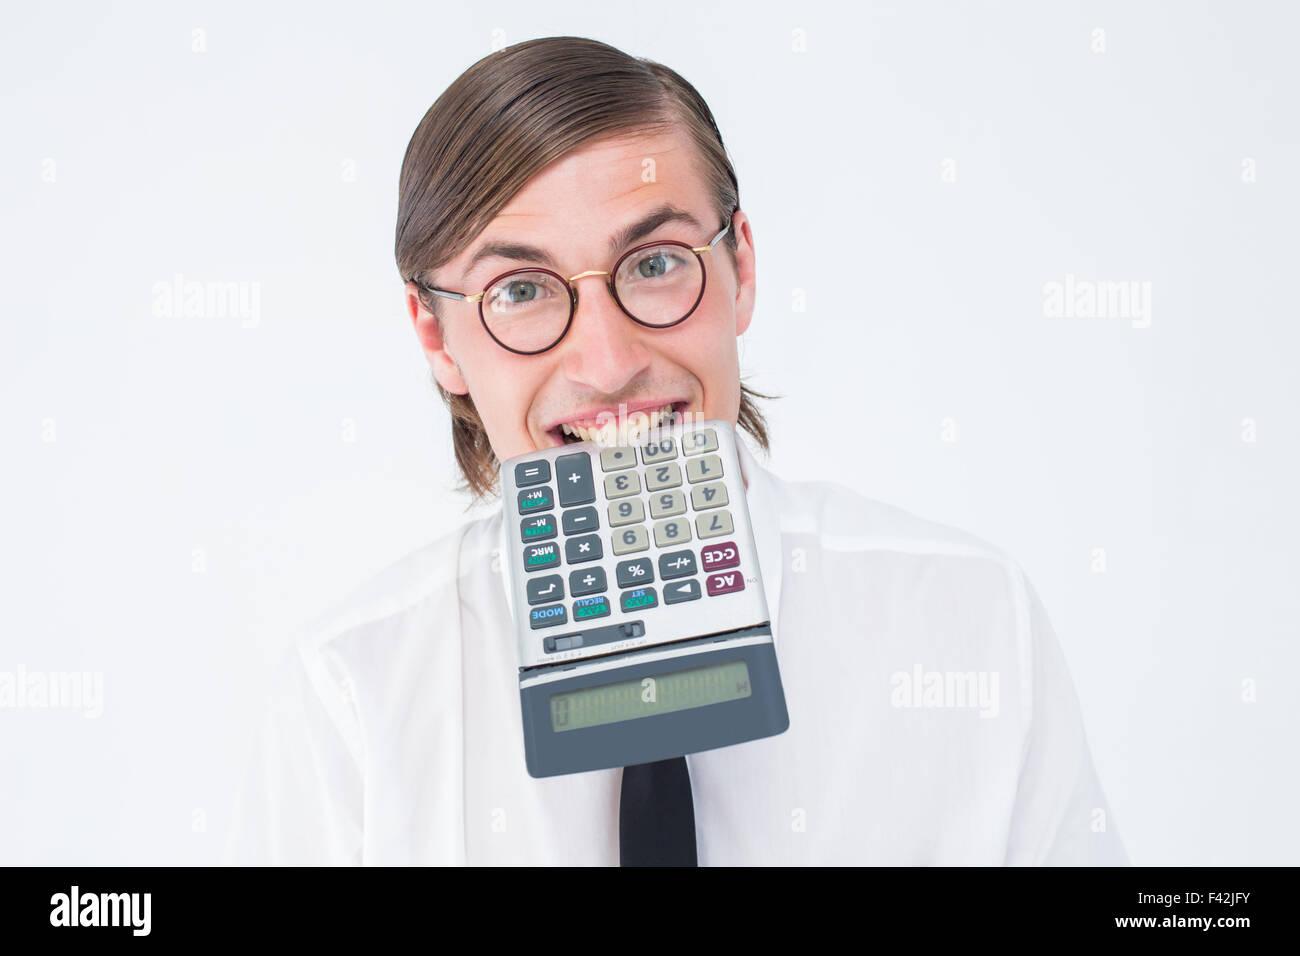 Geeky smiling businessman biting calculator - Stock Image